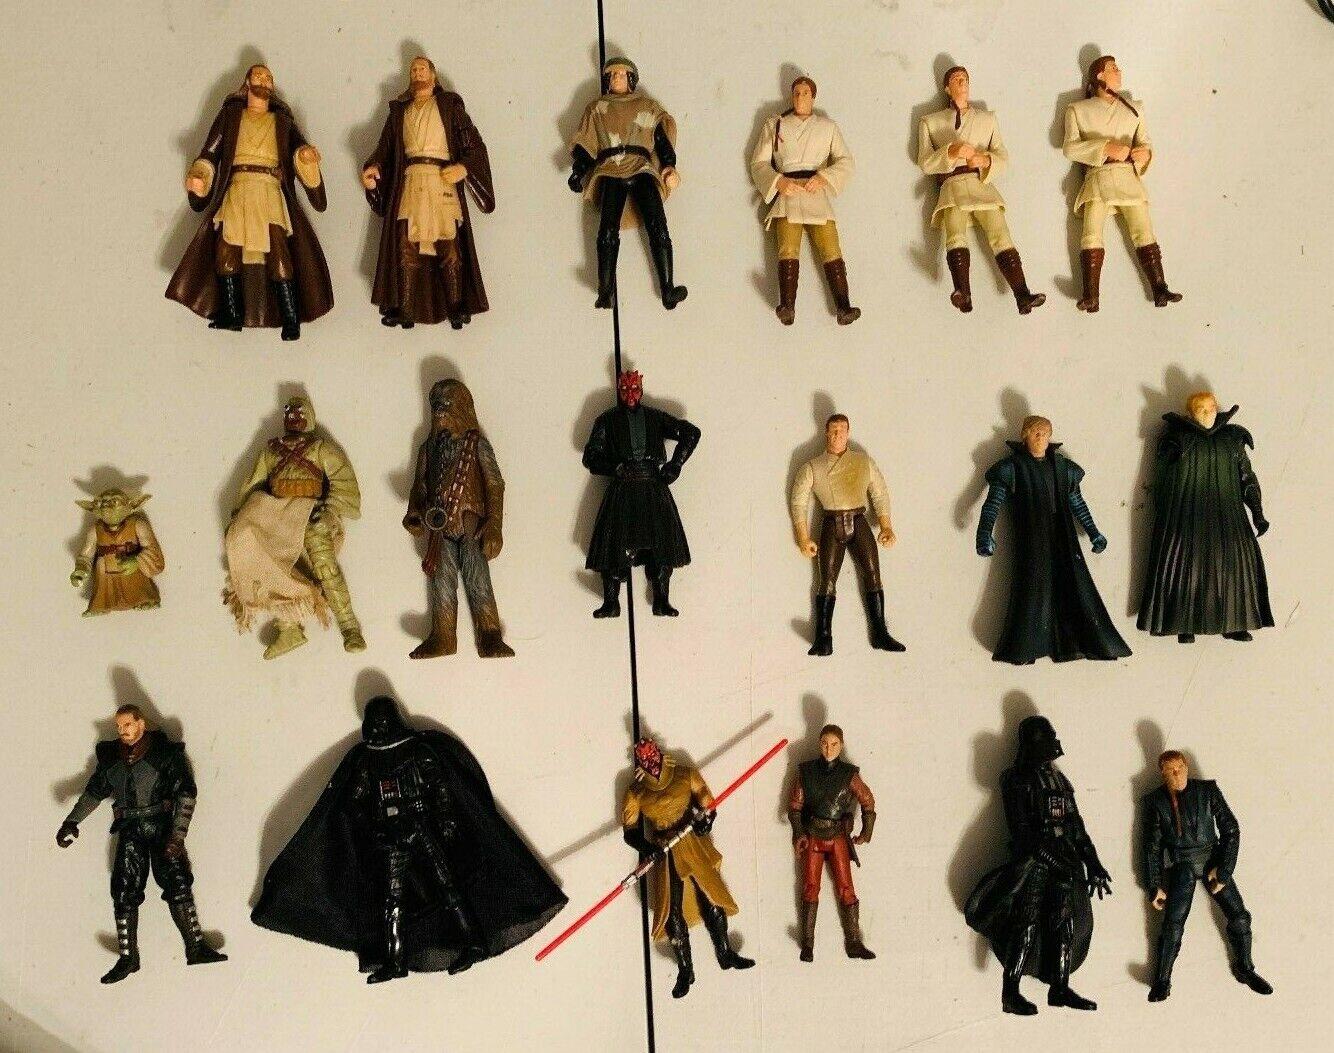 1998 2001  Hasbro Star Wars figurines variété lot de 19  100% livraison gratuite